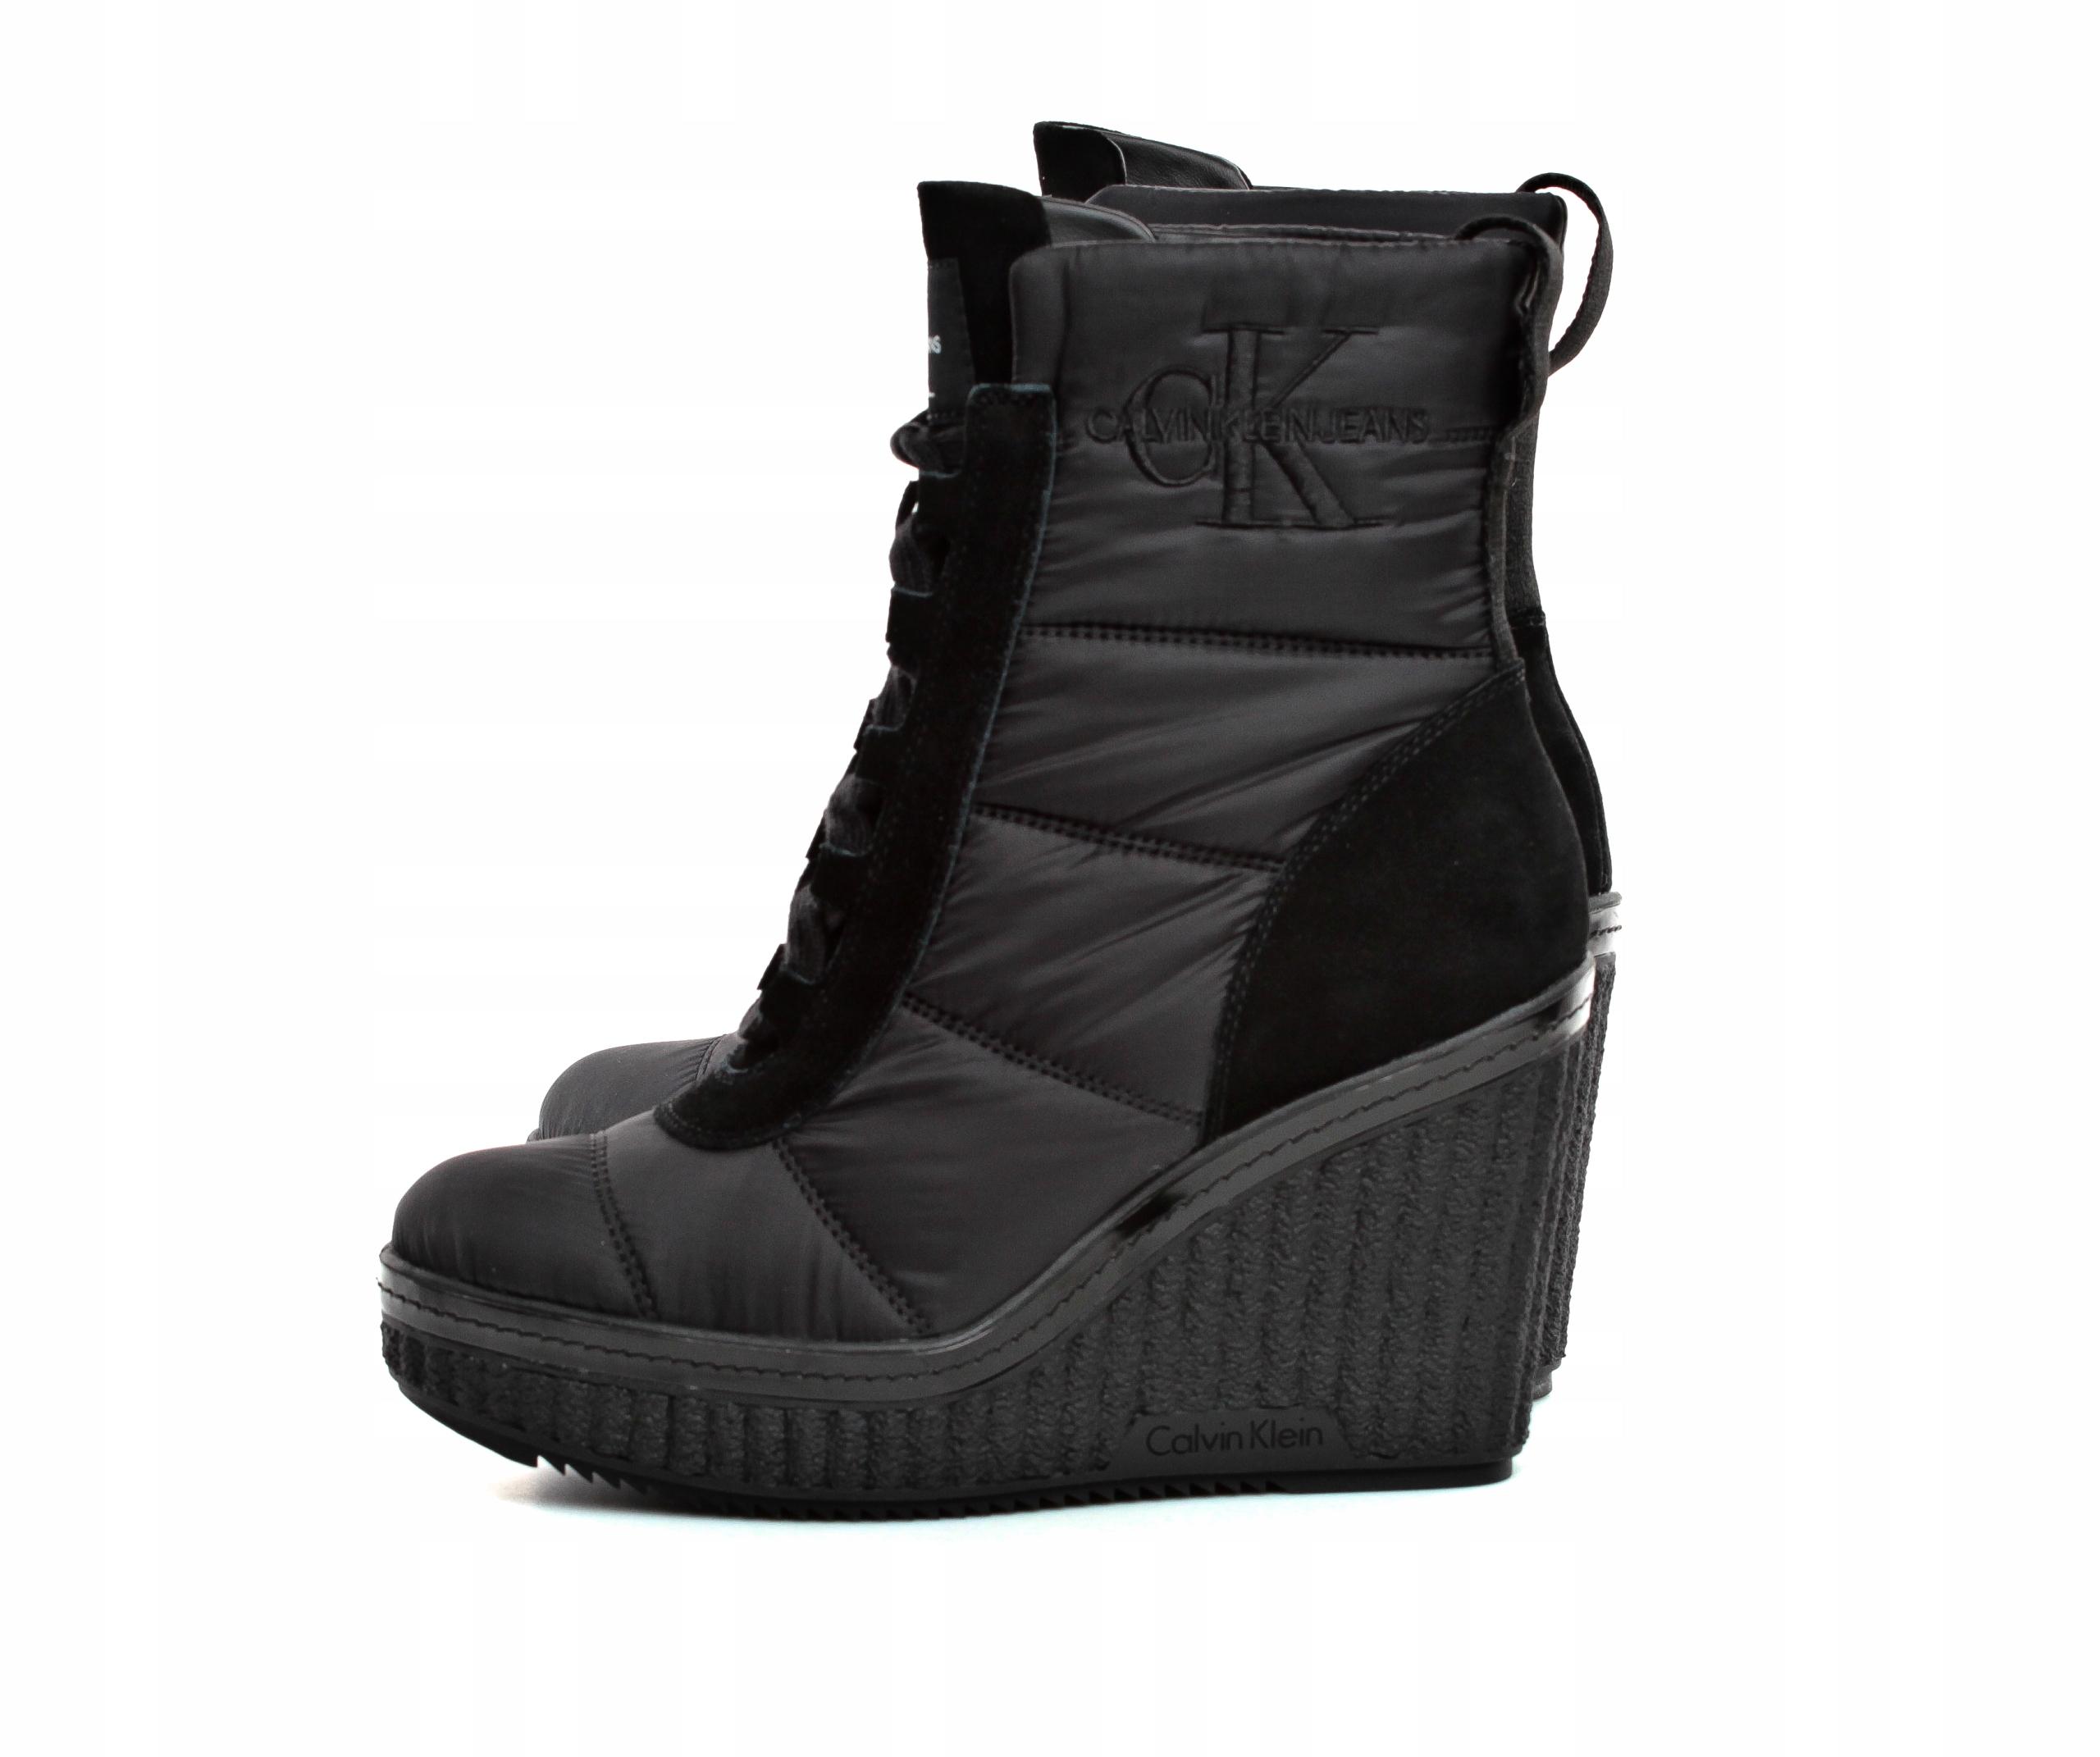 8f795e78fa0c1 Botki Damskie Calvin Klein Jeans Czarne r.36 - 7598512029 ...